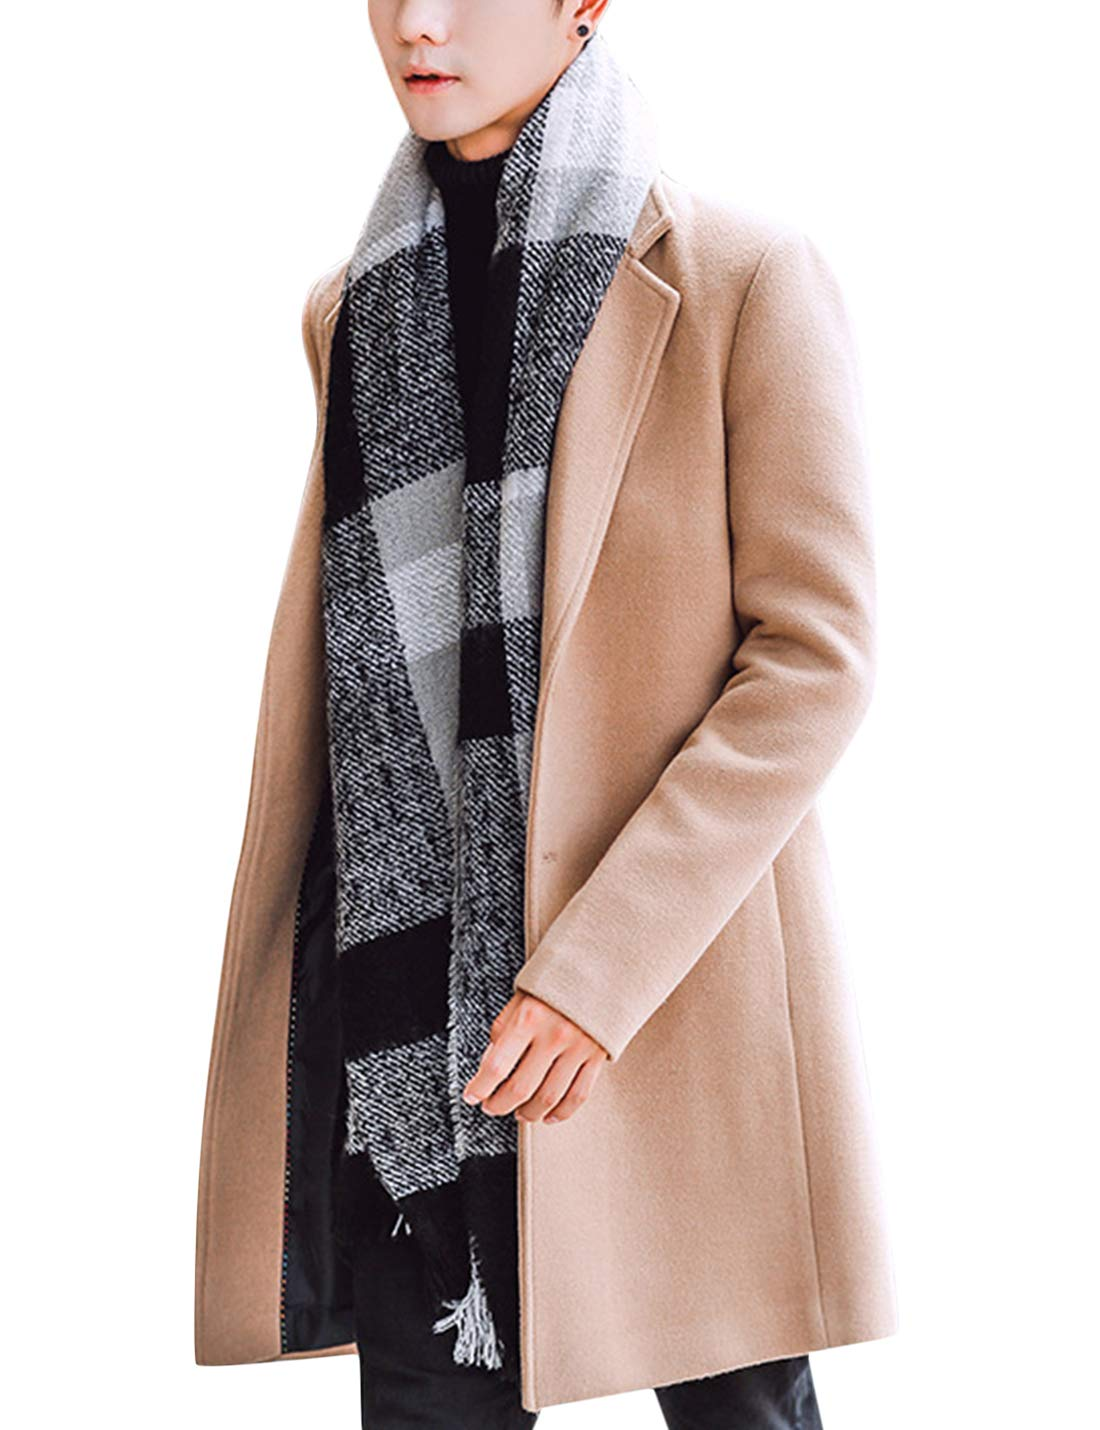 Springrain Men's Notched Lapel Single Breasted Long Pea Coat Trench Coat (Khaki, Large) by Springrain